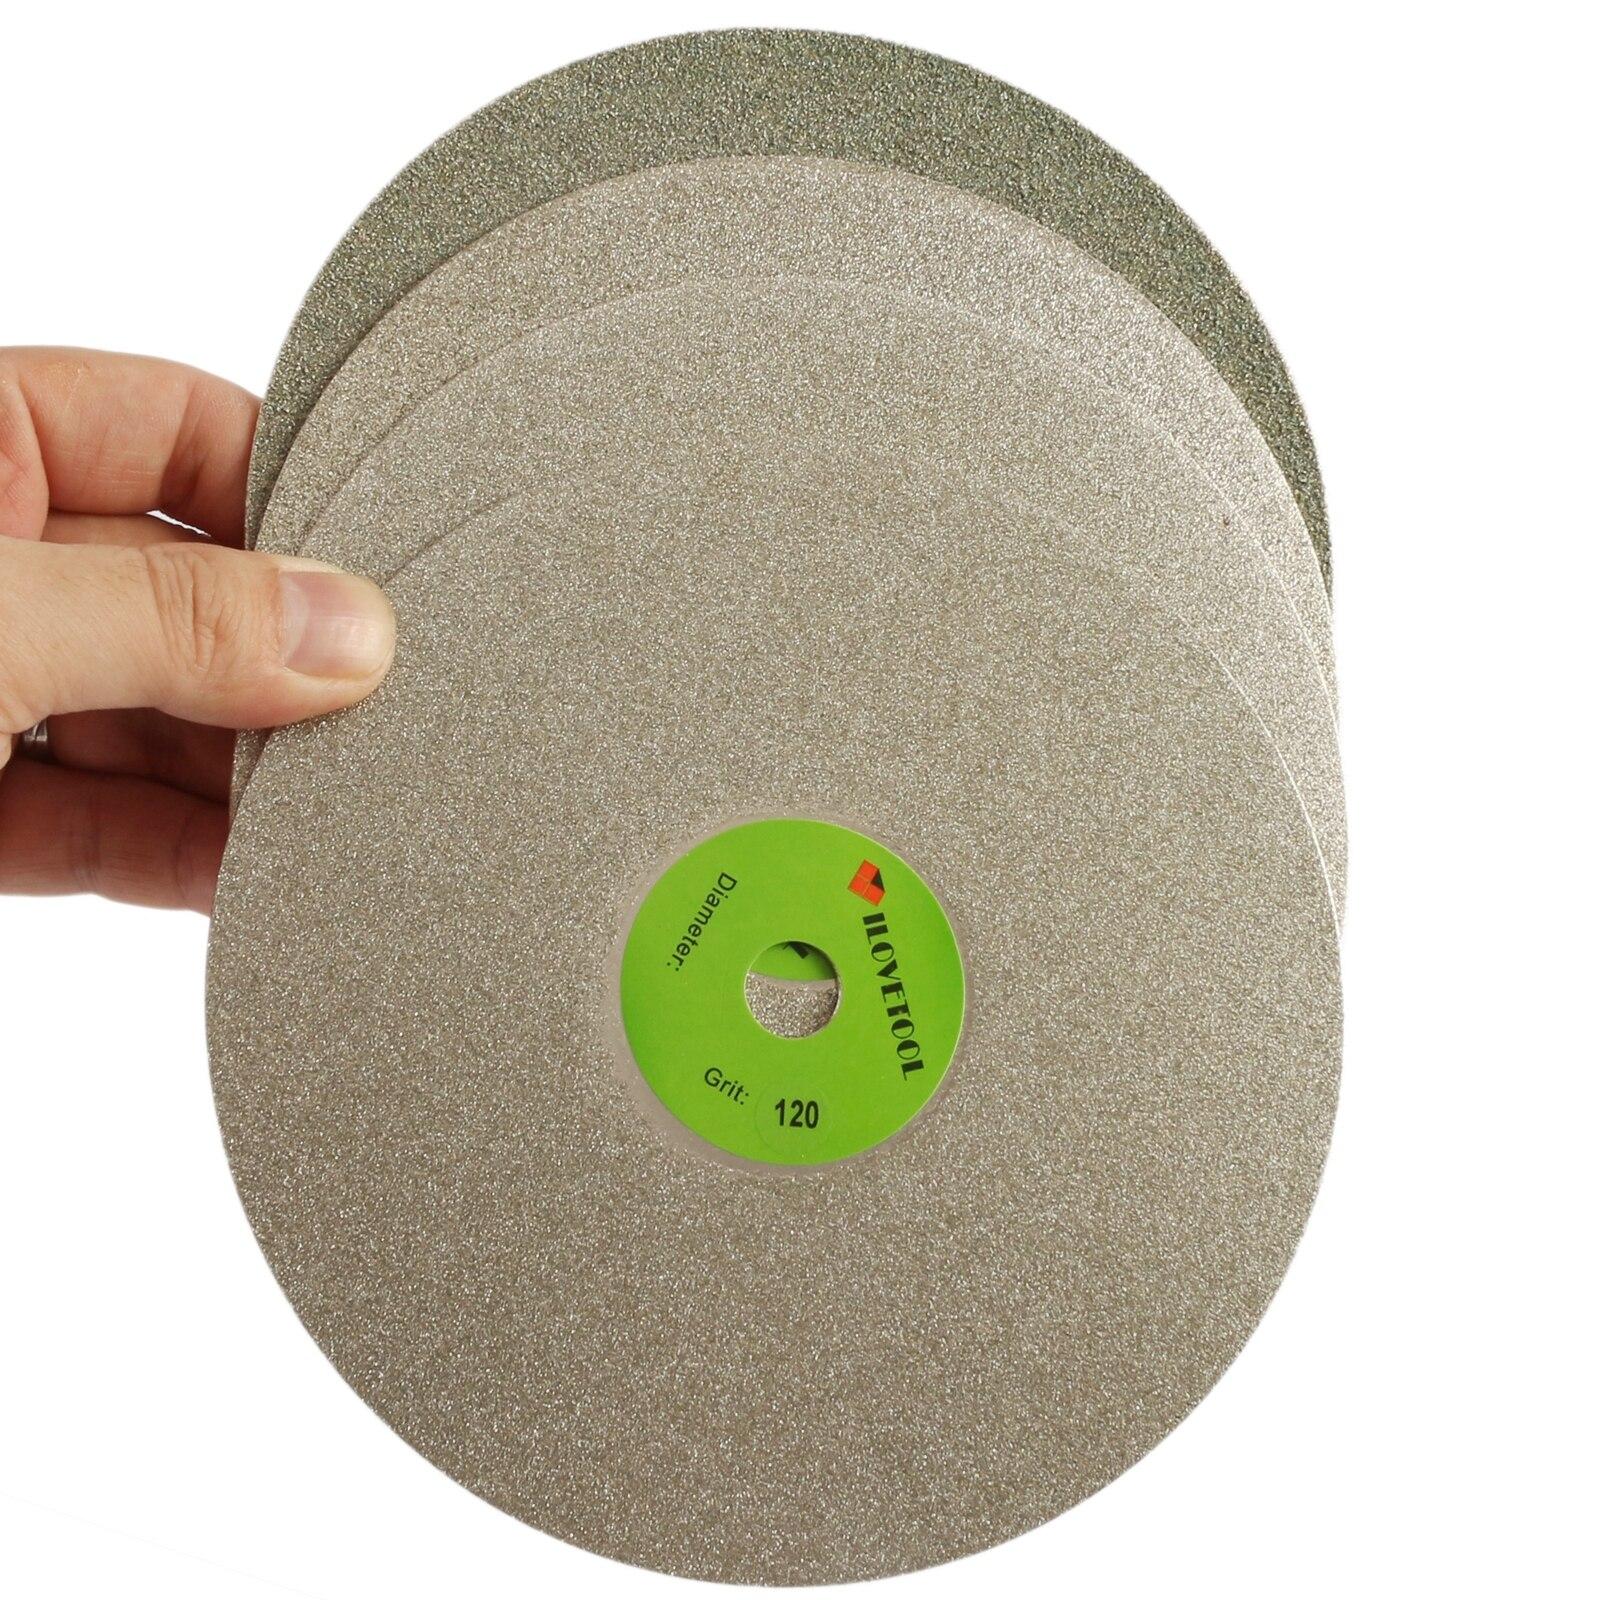 12 inch Diamond coated Flat Lap Disk Grinding Polishing wheel Grit 60 1000 ILOVETOOL